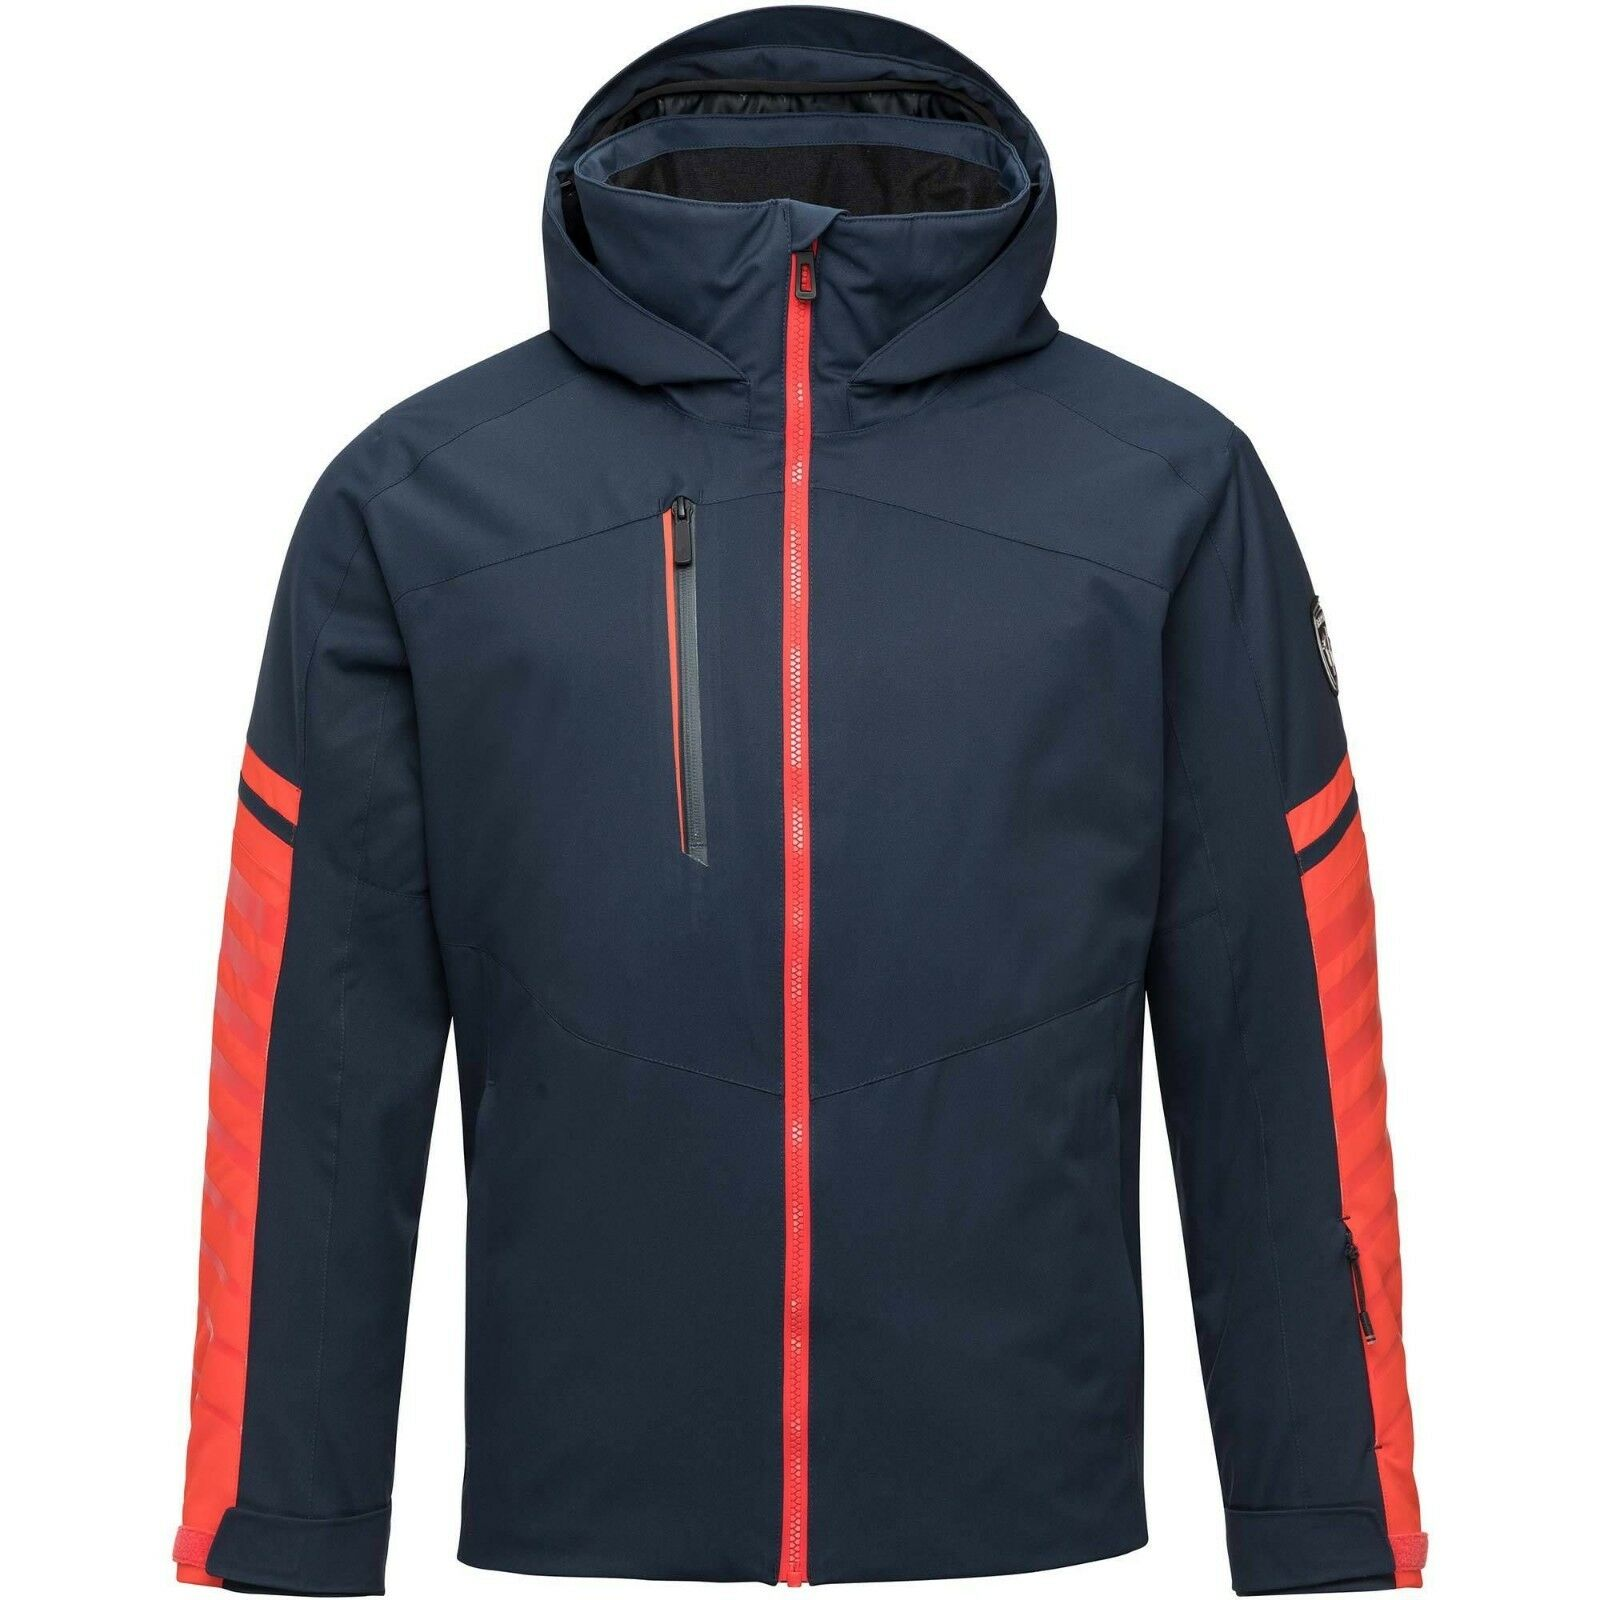 Rossignol Fonction Jacket Men Skijacke Herren Ski Jacke RLHMJ30 eclipse blau